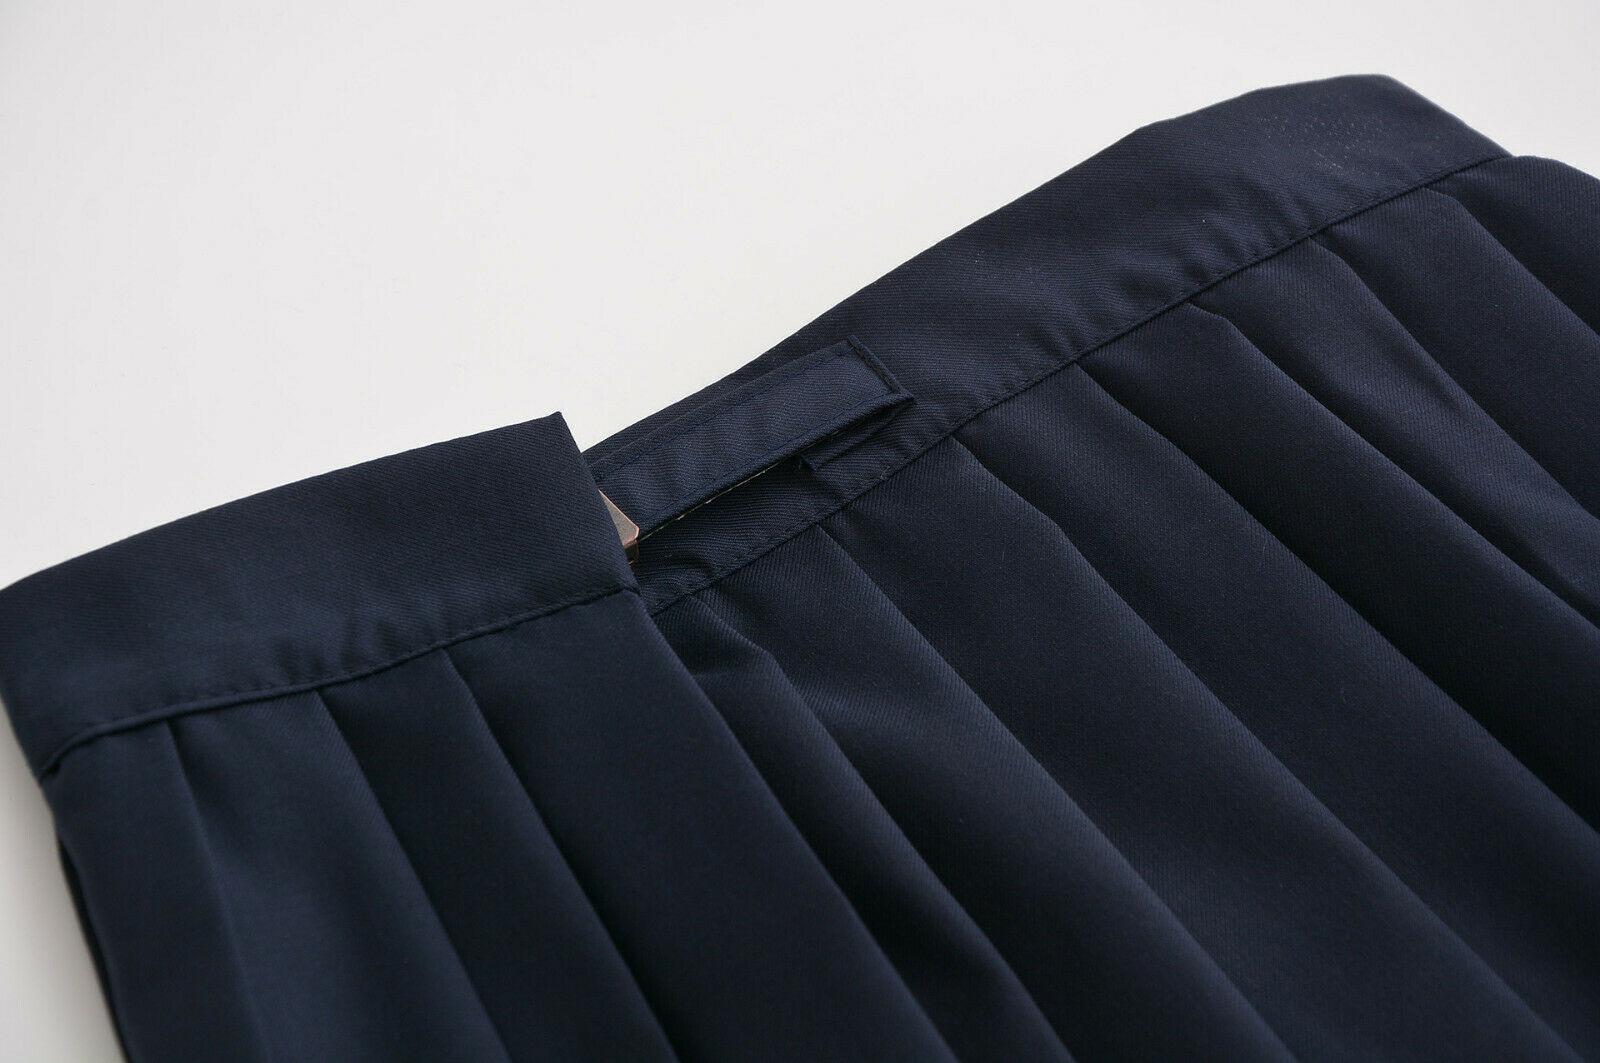 Japanese JK School Girl School Uniform Outfit Pleated Skirt Dress Academic Style